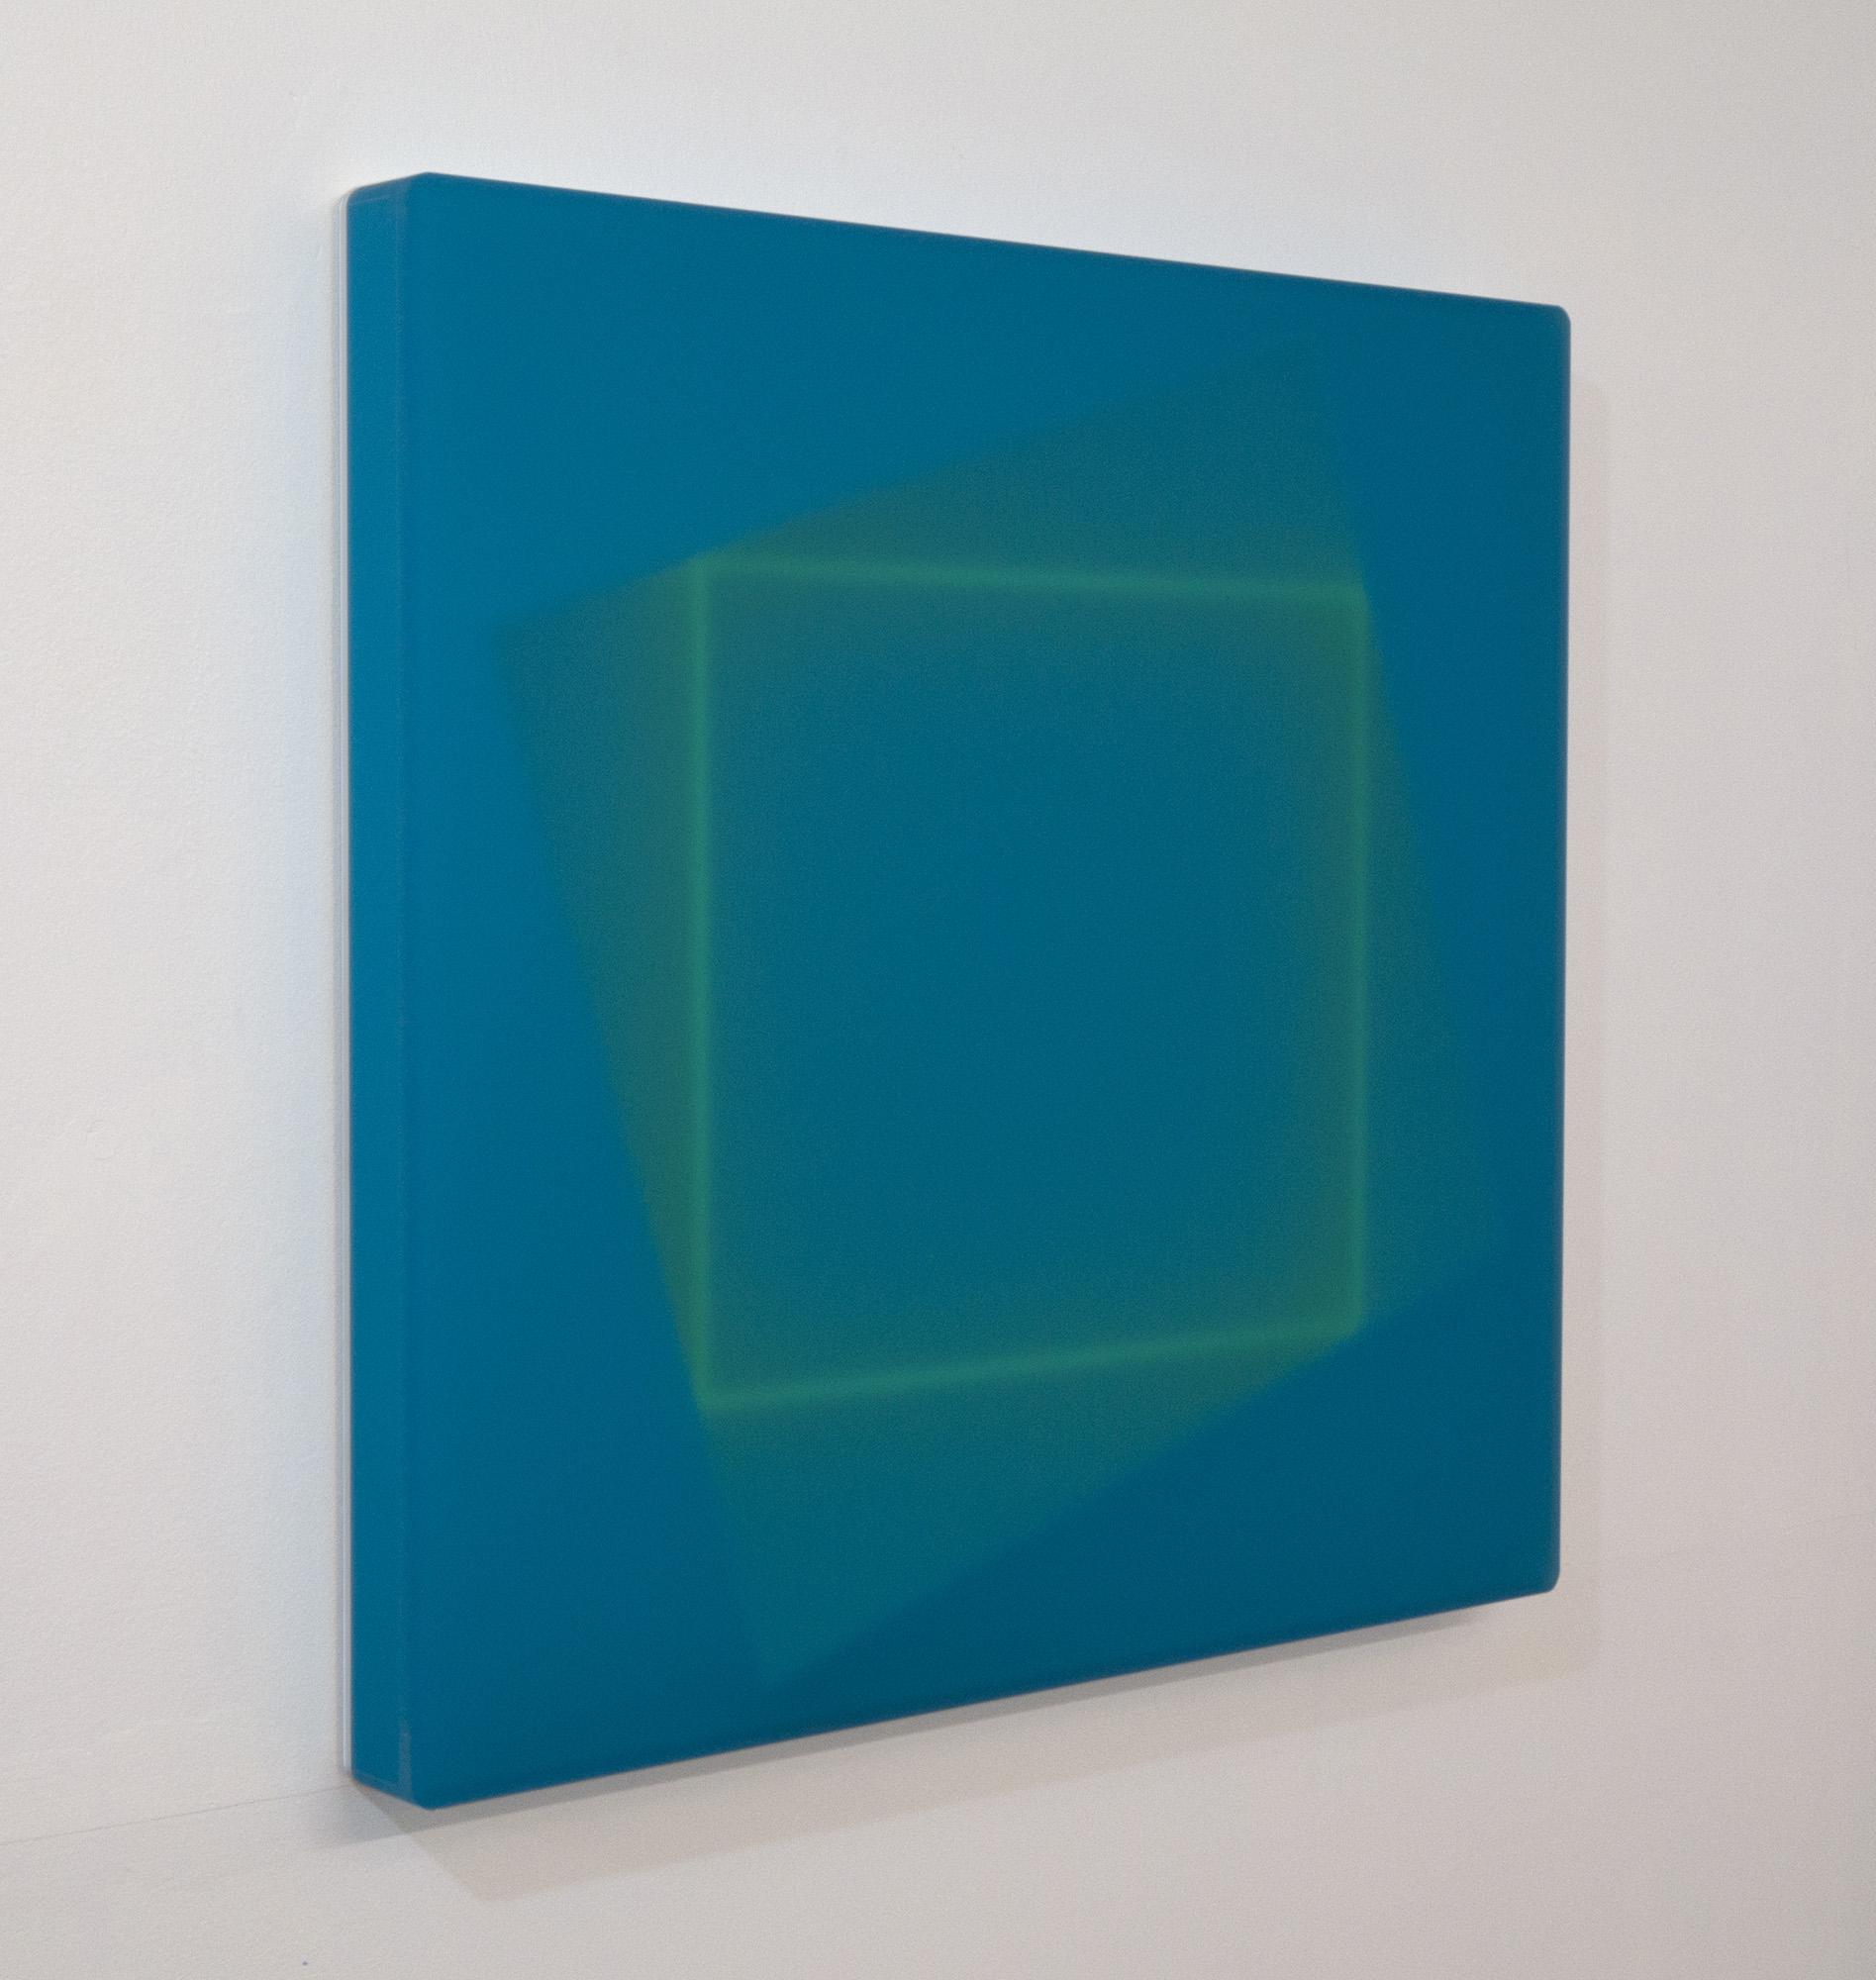 Karyn Taylor, Observer's Gaze, 2017, cast acrylic, 42 x 48 x 2.5cm, side view.jpg